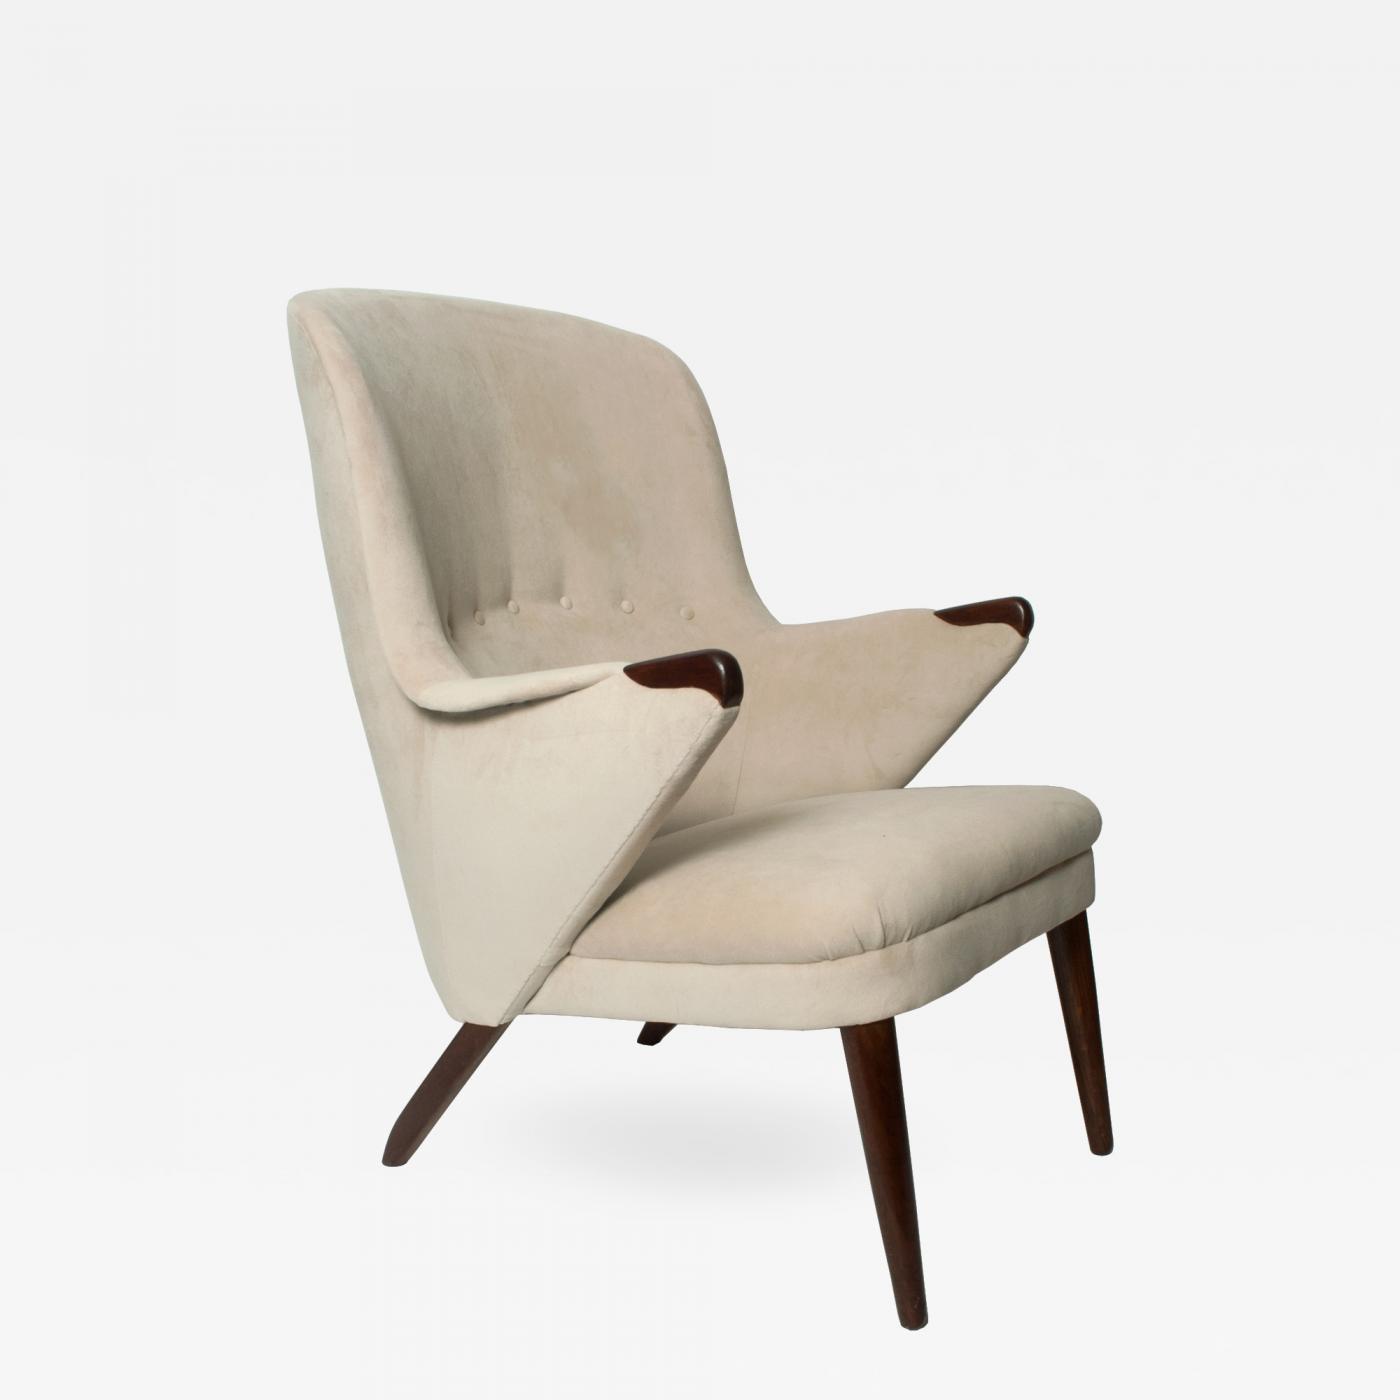 Awe Inspiring Scandinavian Modern Curved High Back Upholstered Lounge Chair With Teak Legs Uwap Interior Chair Design Uwaporg